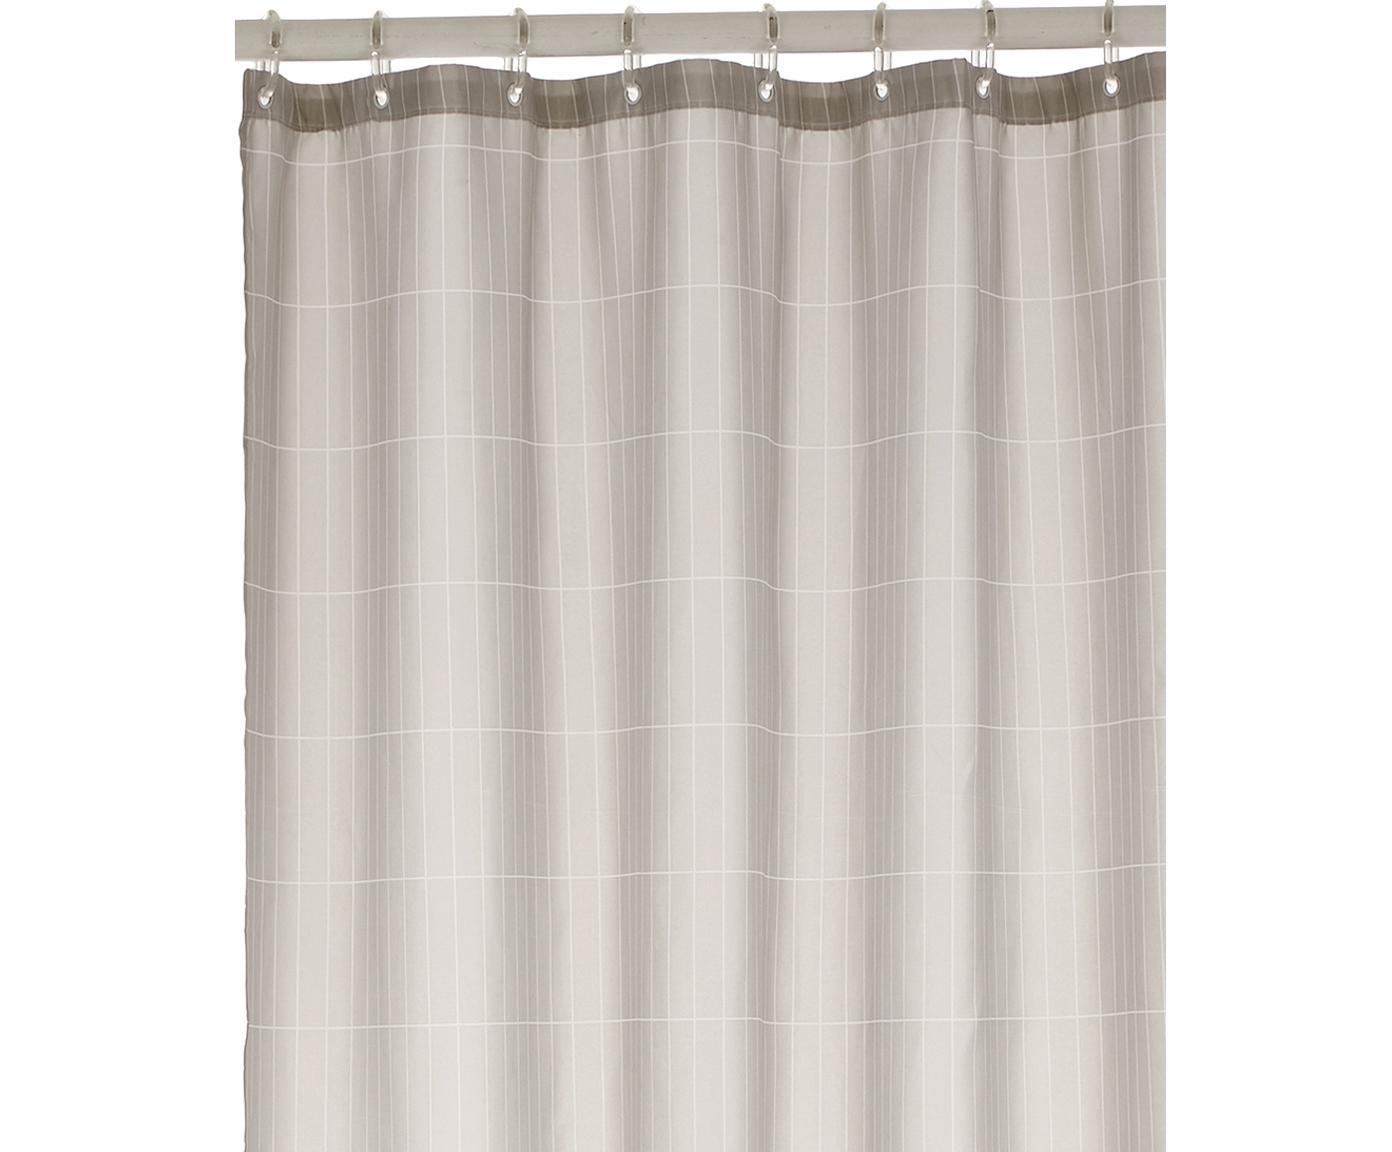 Tenda da doccia a quadri Tiles, Grigio chiaro, Larg. 180 x Lung. 200 cm